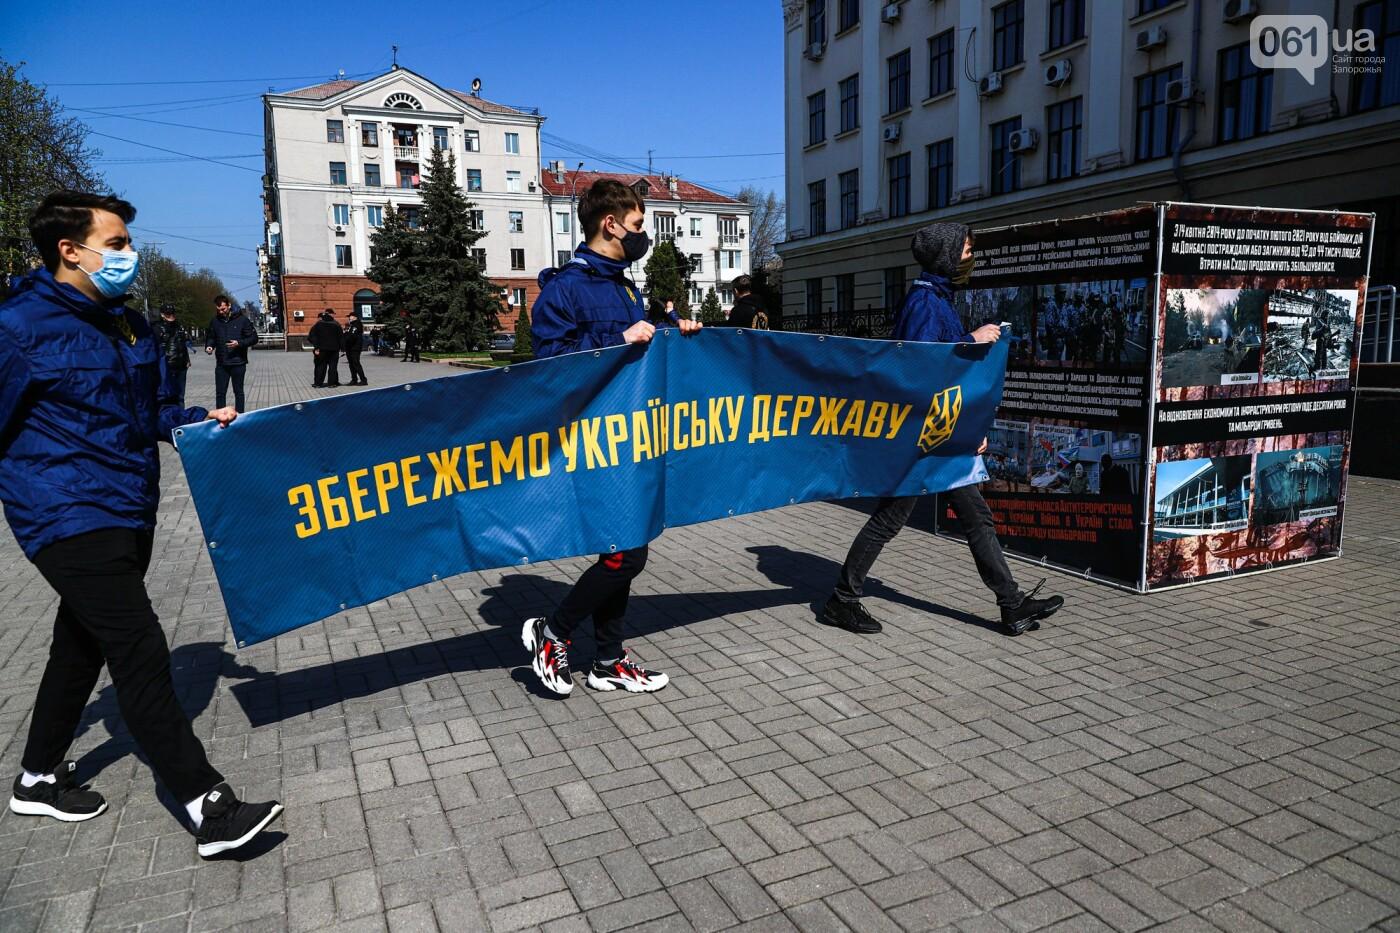 В Запорожье возле мэрии установили стенды с портретами Медведчука и Шария, - ФОТО, фото-5